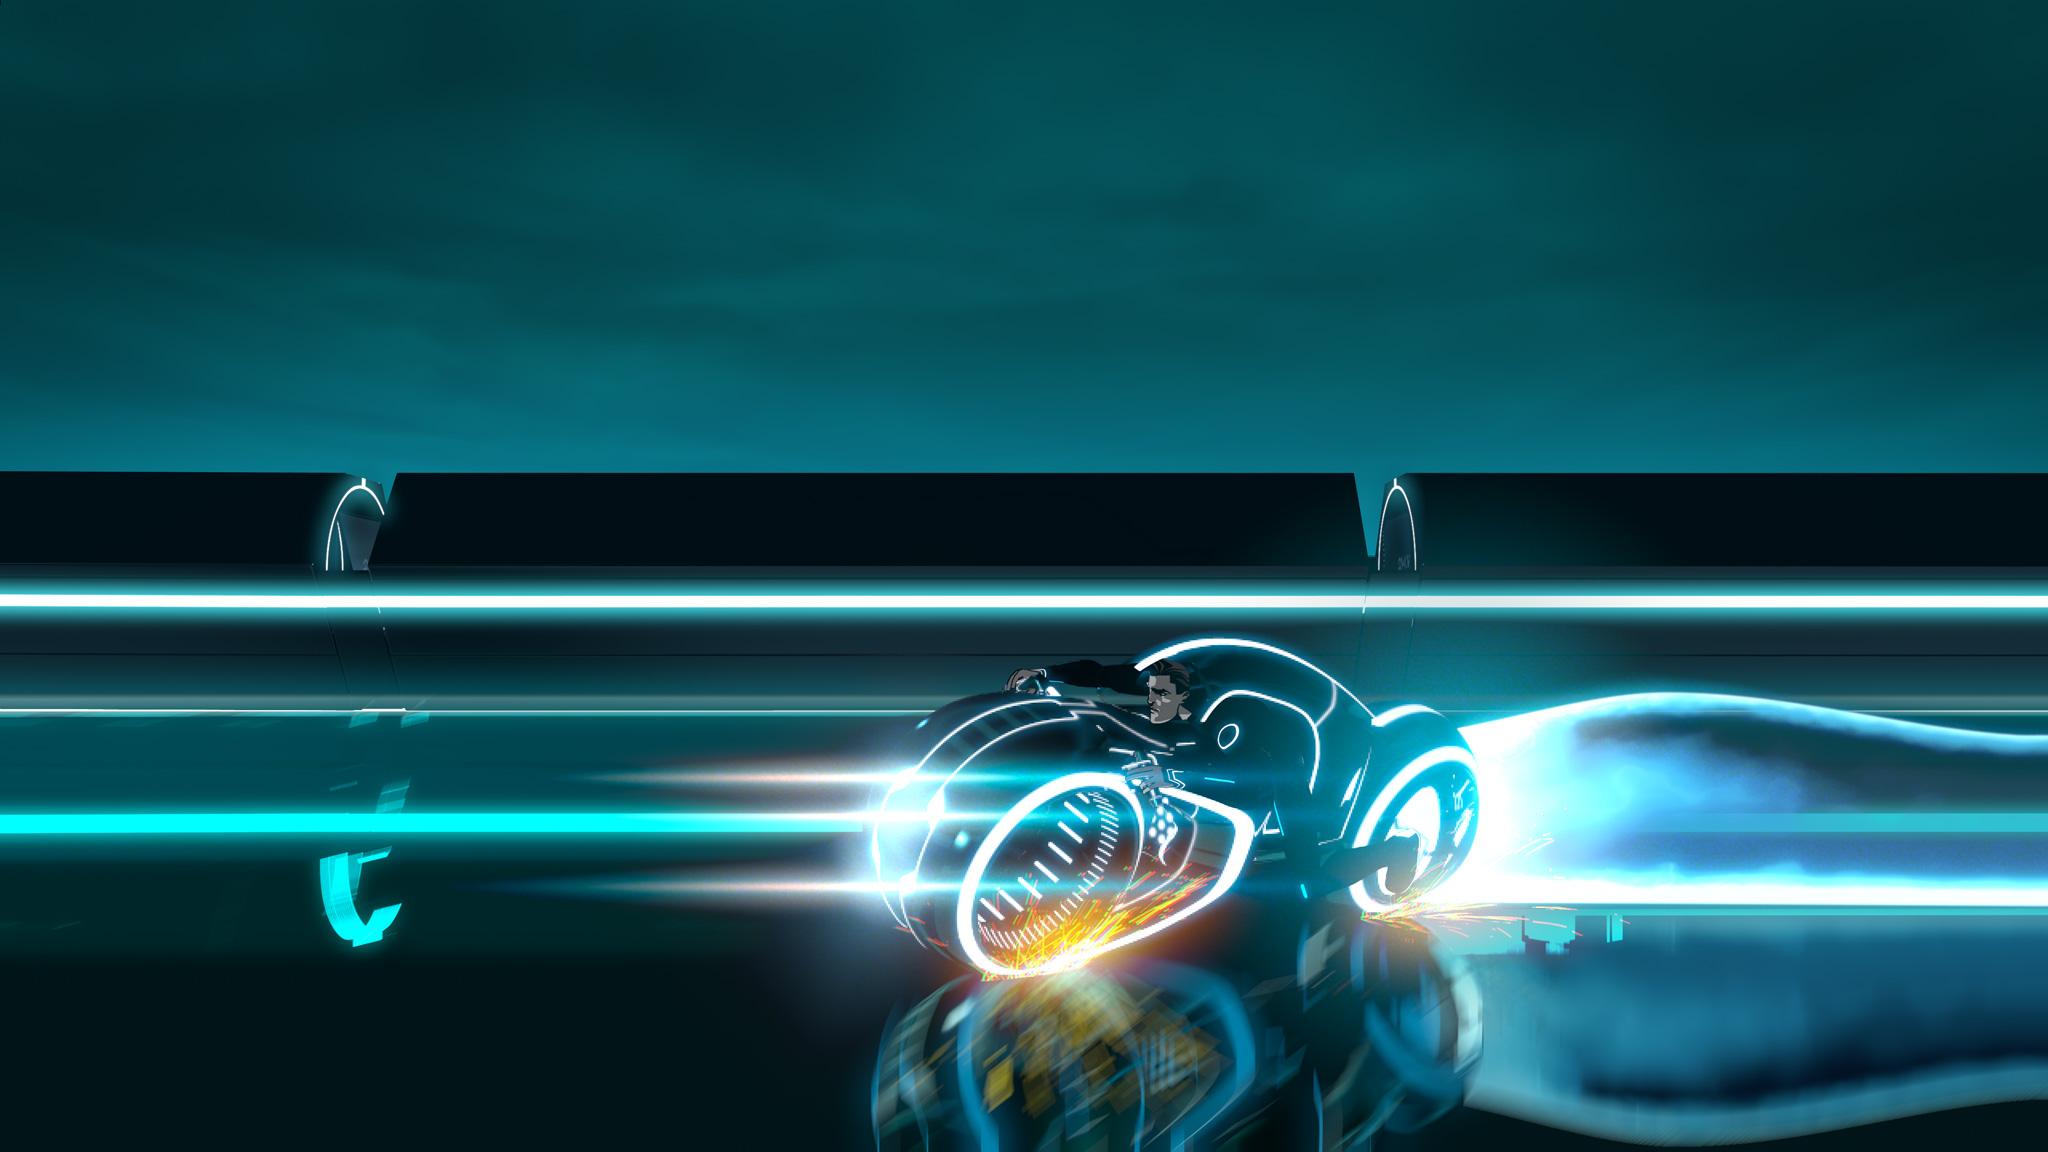 Tron Uprising Hd Wallpaper Background Image 2048x1152 Id